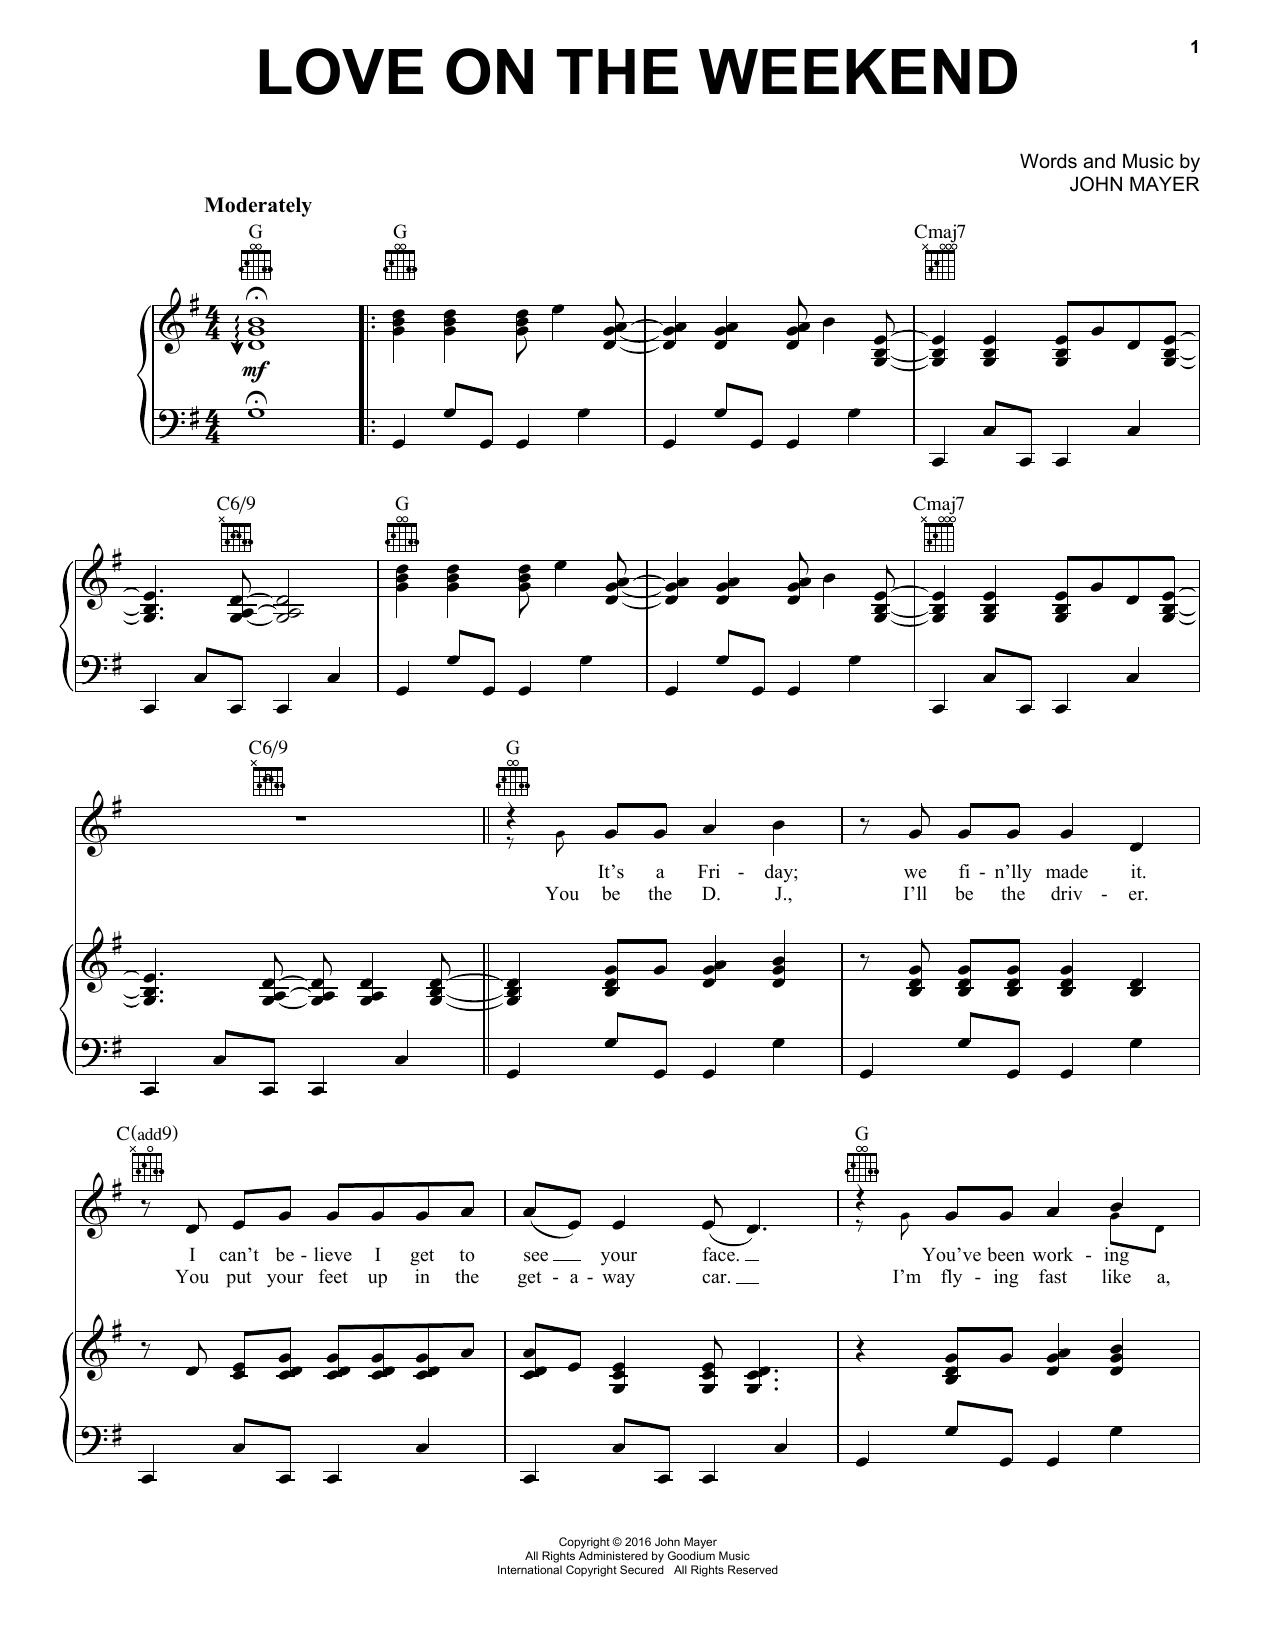 Love On The Weekend Sheet Music John Mayer Piano Vocal Guitar Right Hand Melody John Mayer Lyrics John Mayer Digital Sheet Music